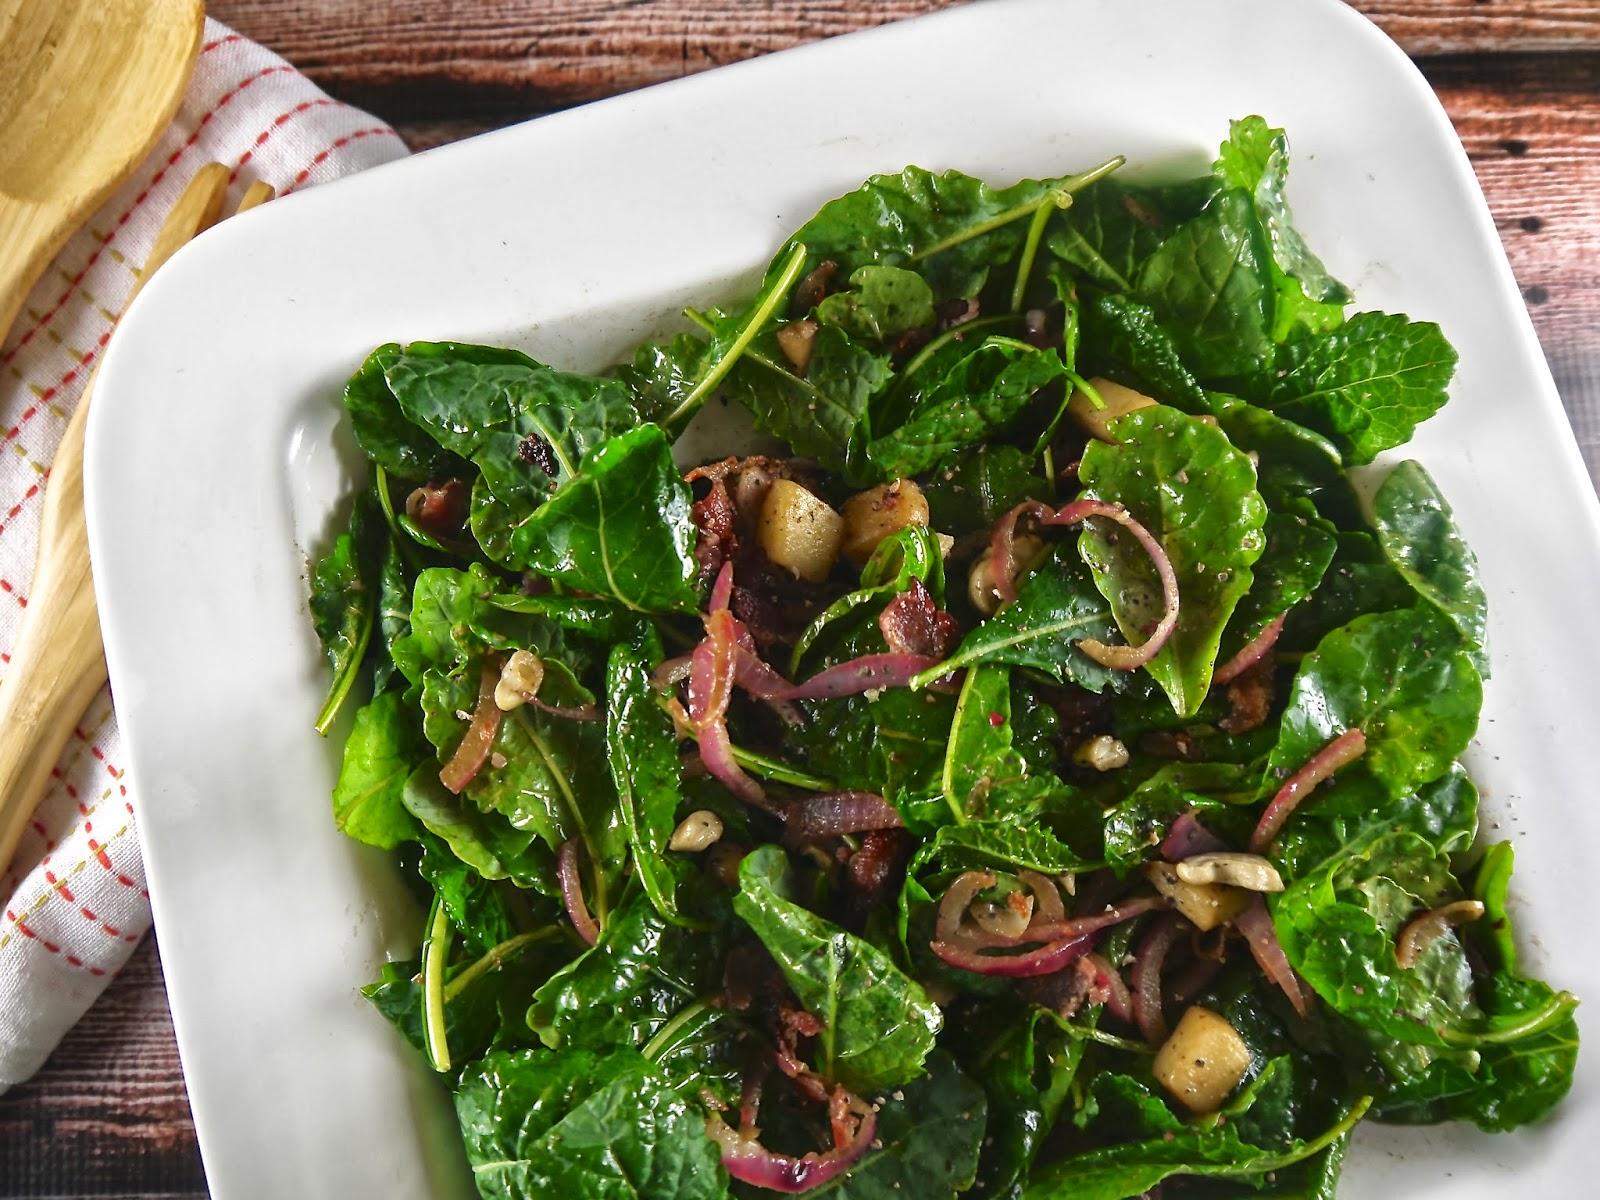 the preppy paleo: Warm Kale Salad with Bacon & Apple